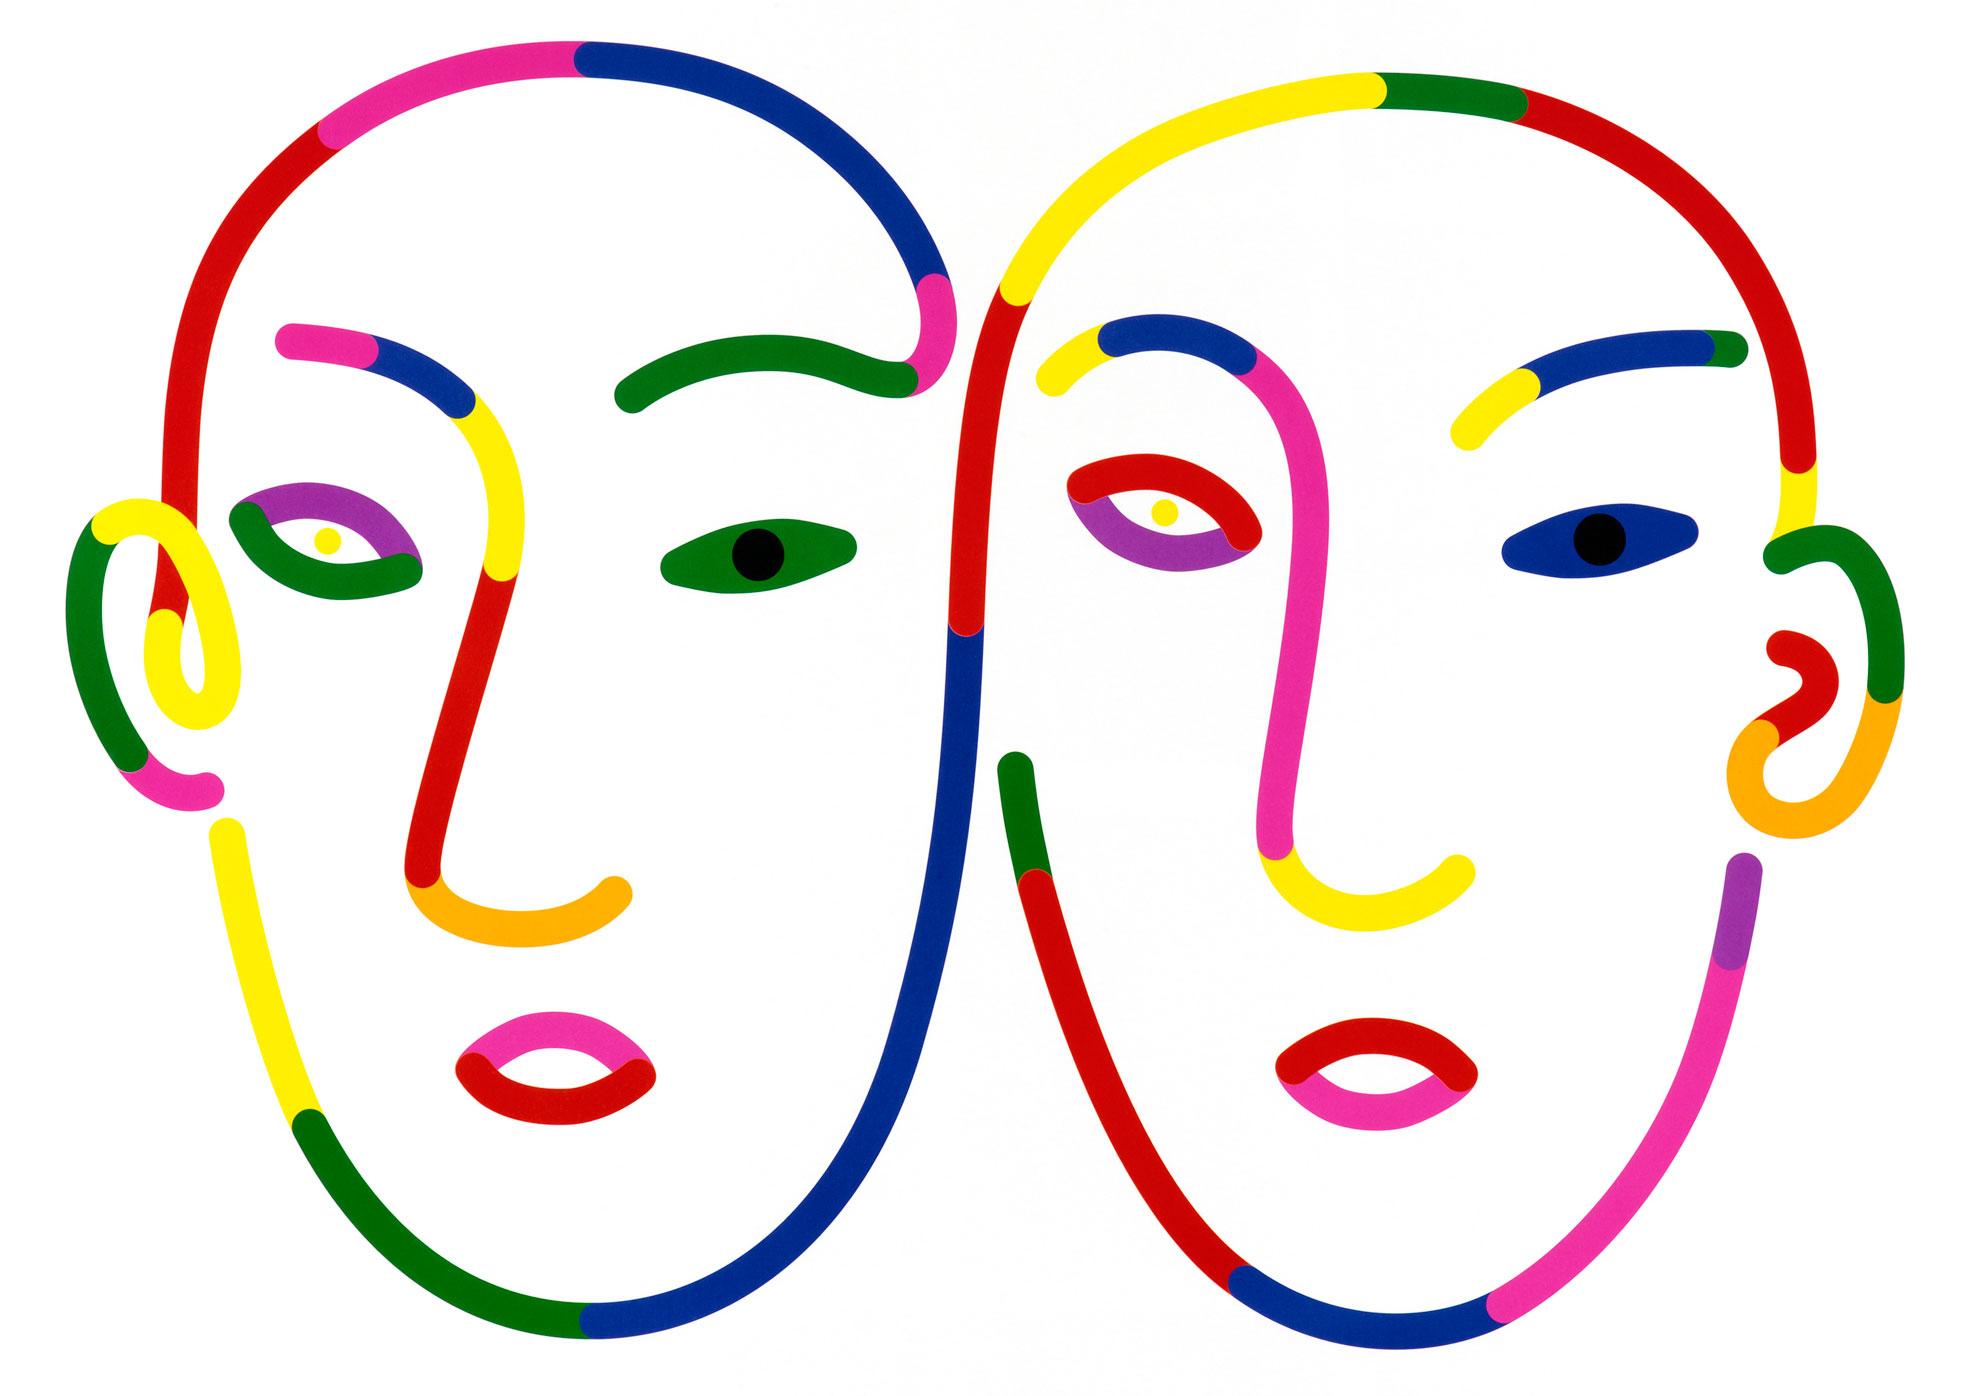 Ikko-Tanaka-graphisme-japon-detail-affiche-shiseido